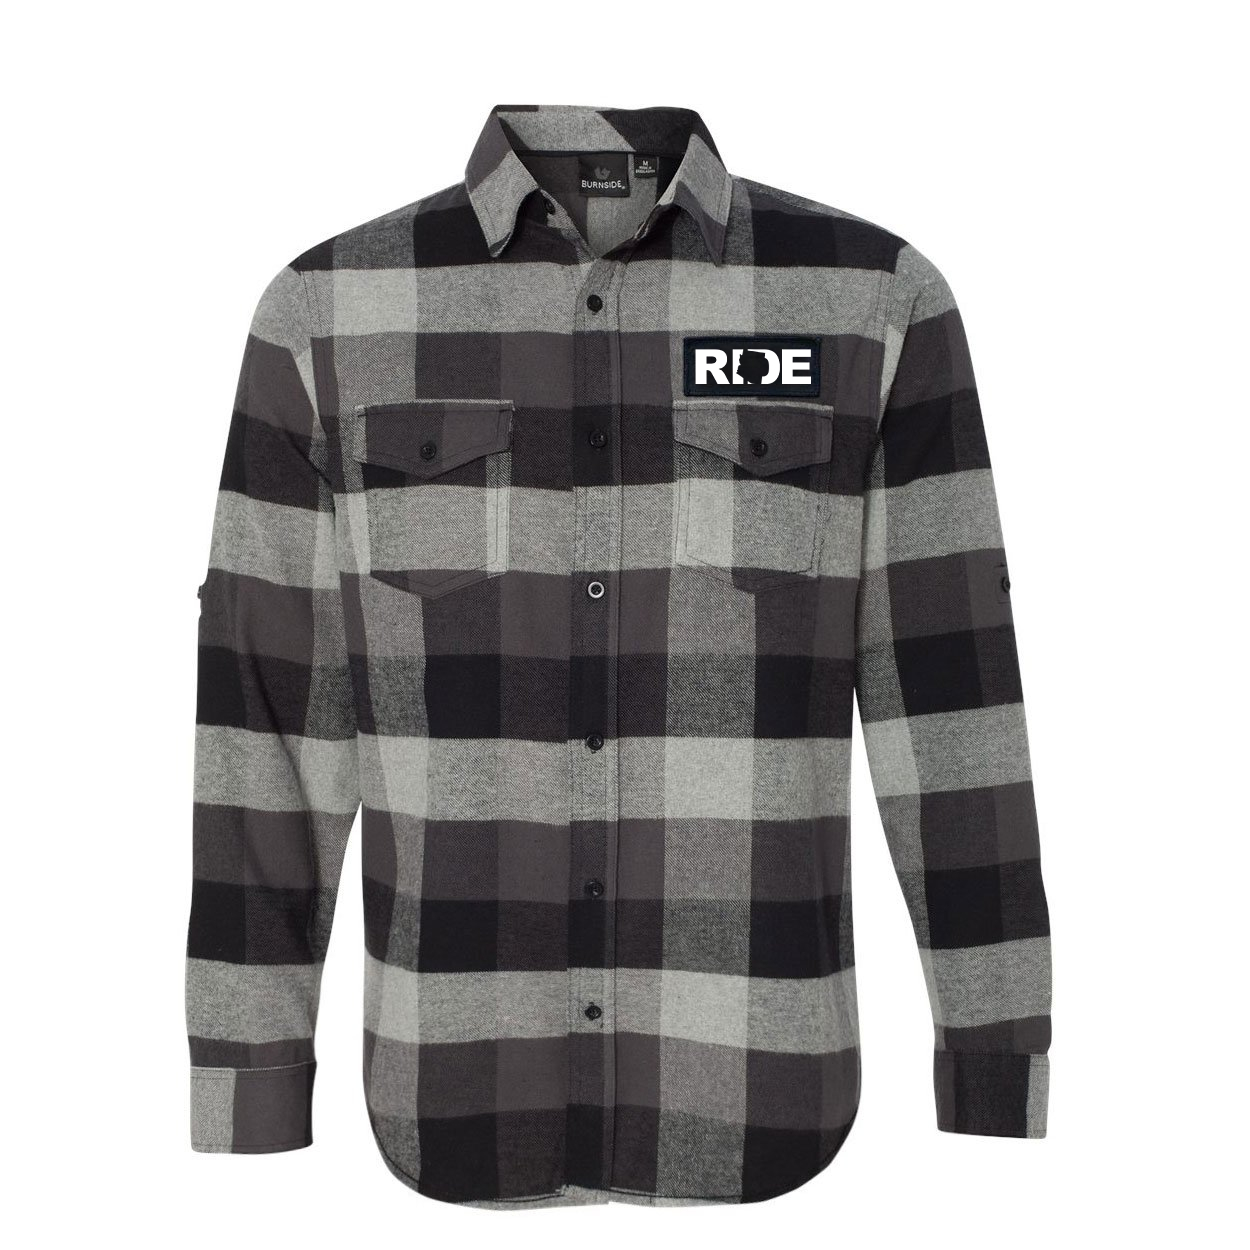 Ride Arizona Classic Unisex Long Sleeve Woven Patch Flannel Shirt Black/Gray (White Logo)